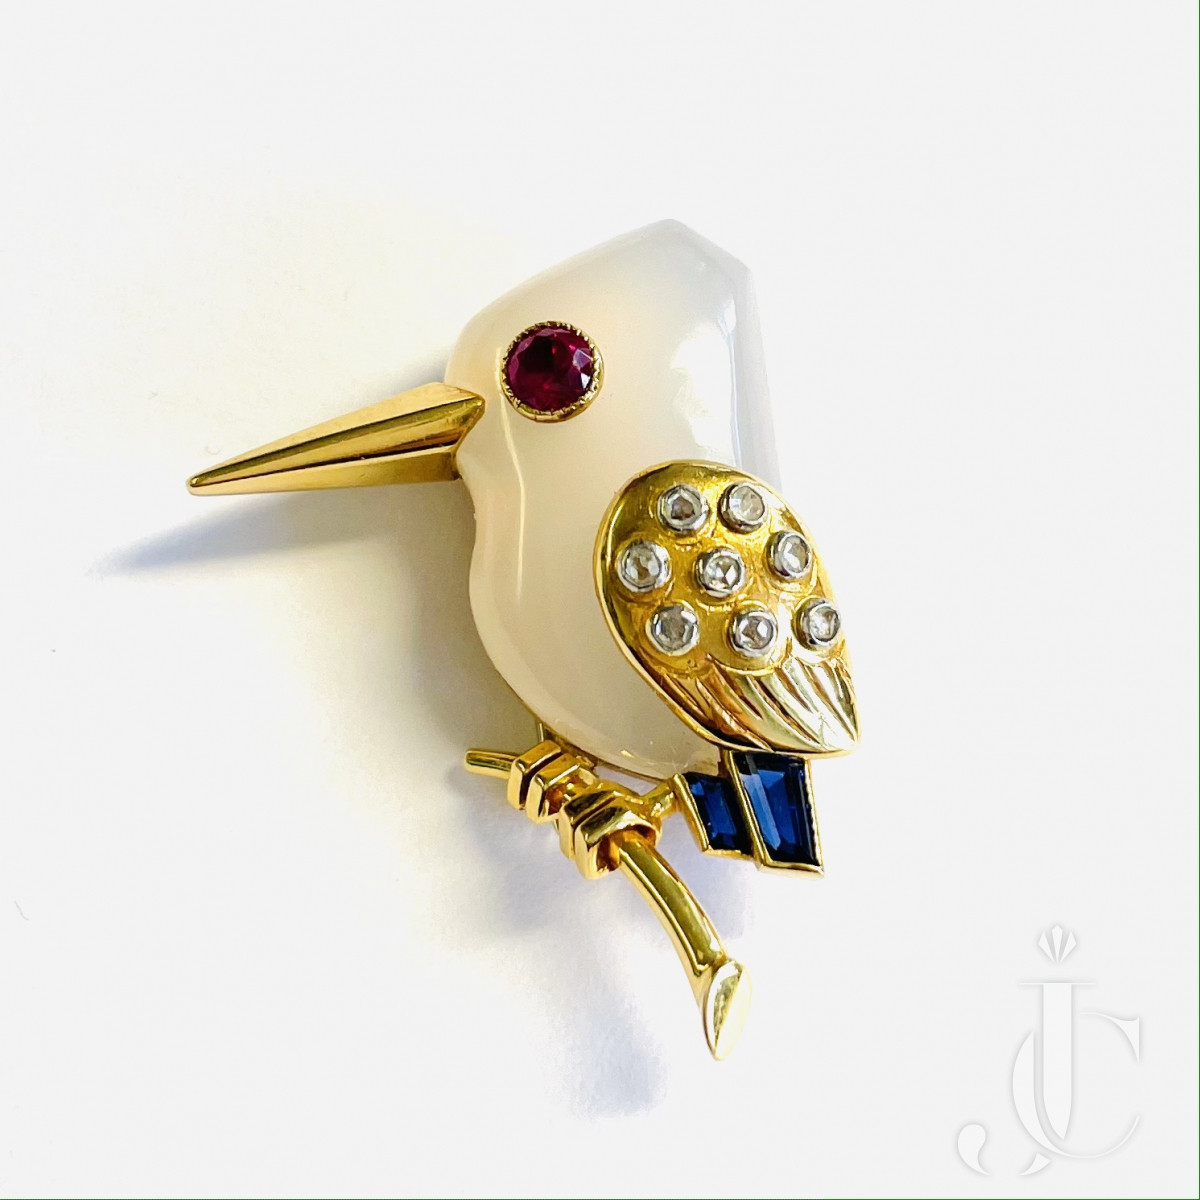 Cartier Kingfisher Brooch